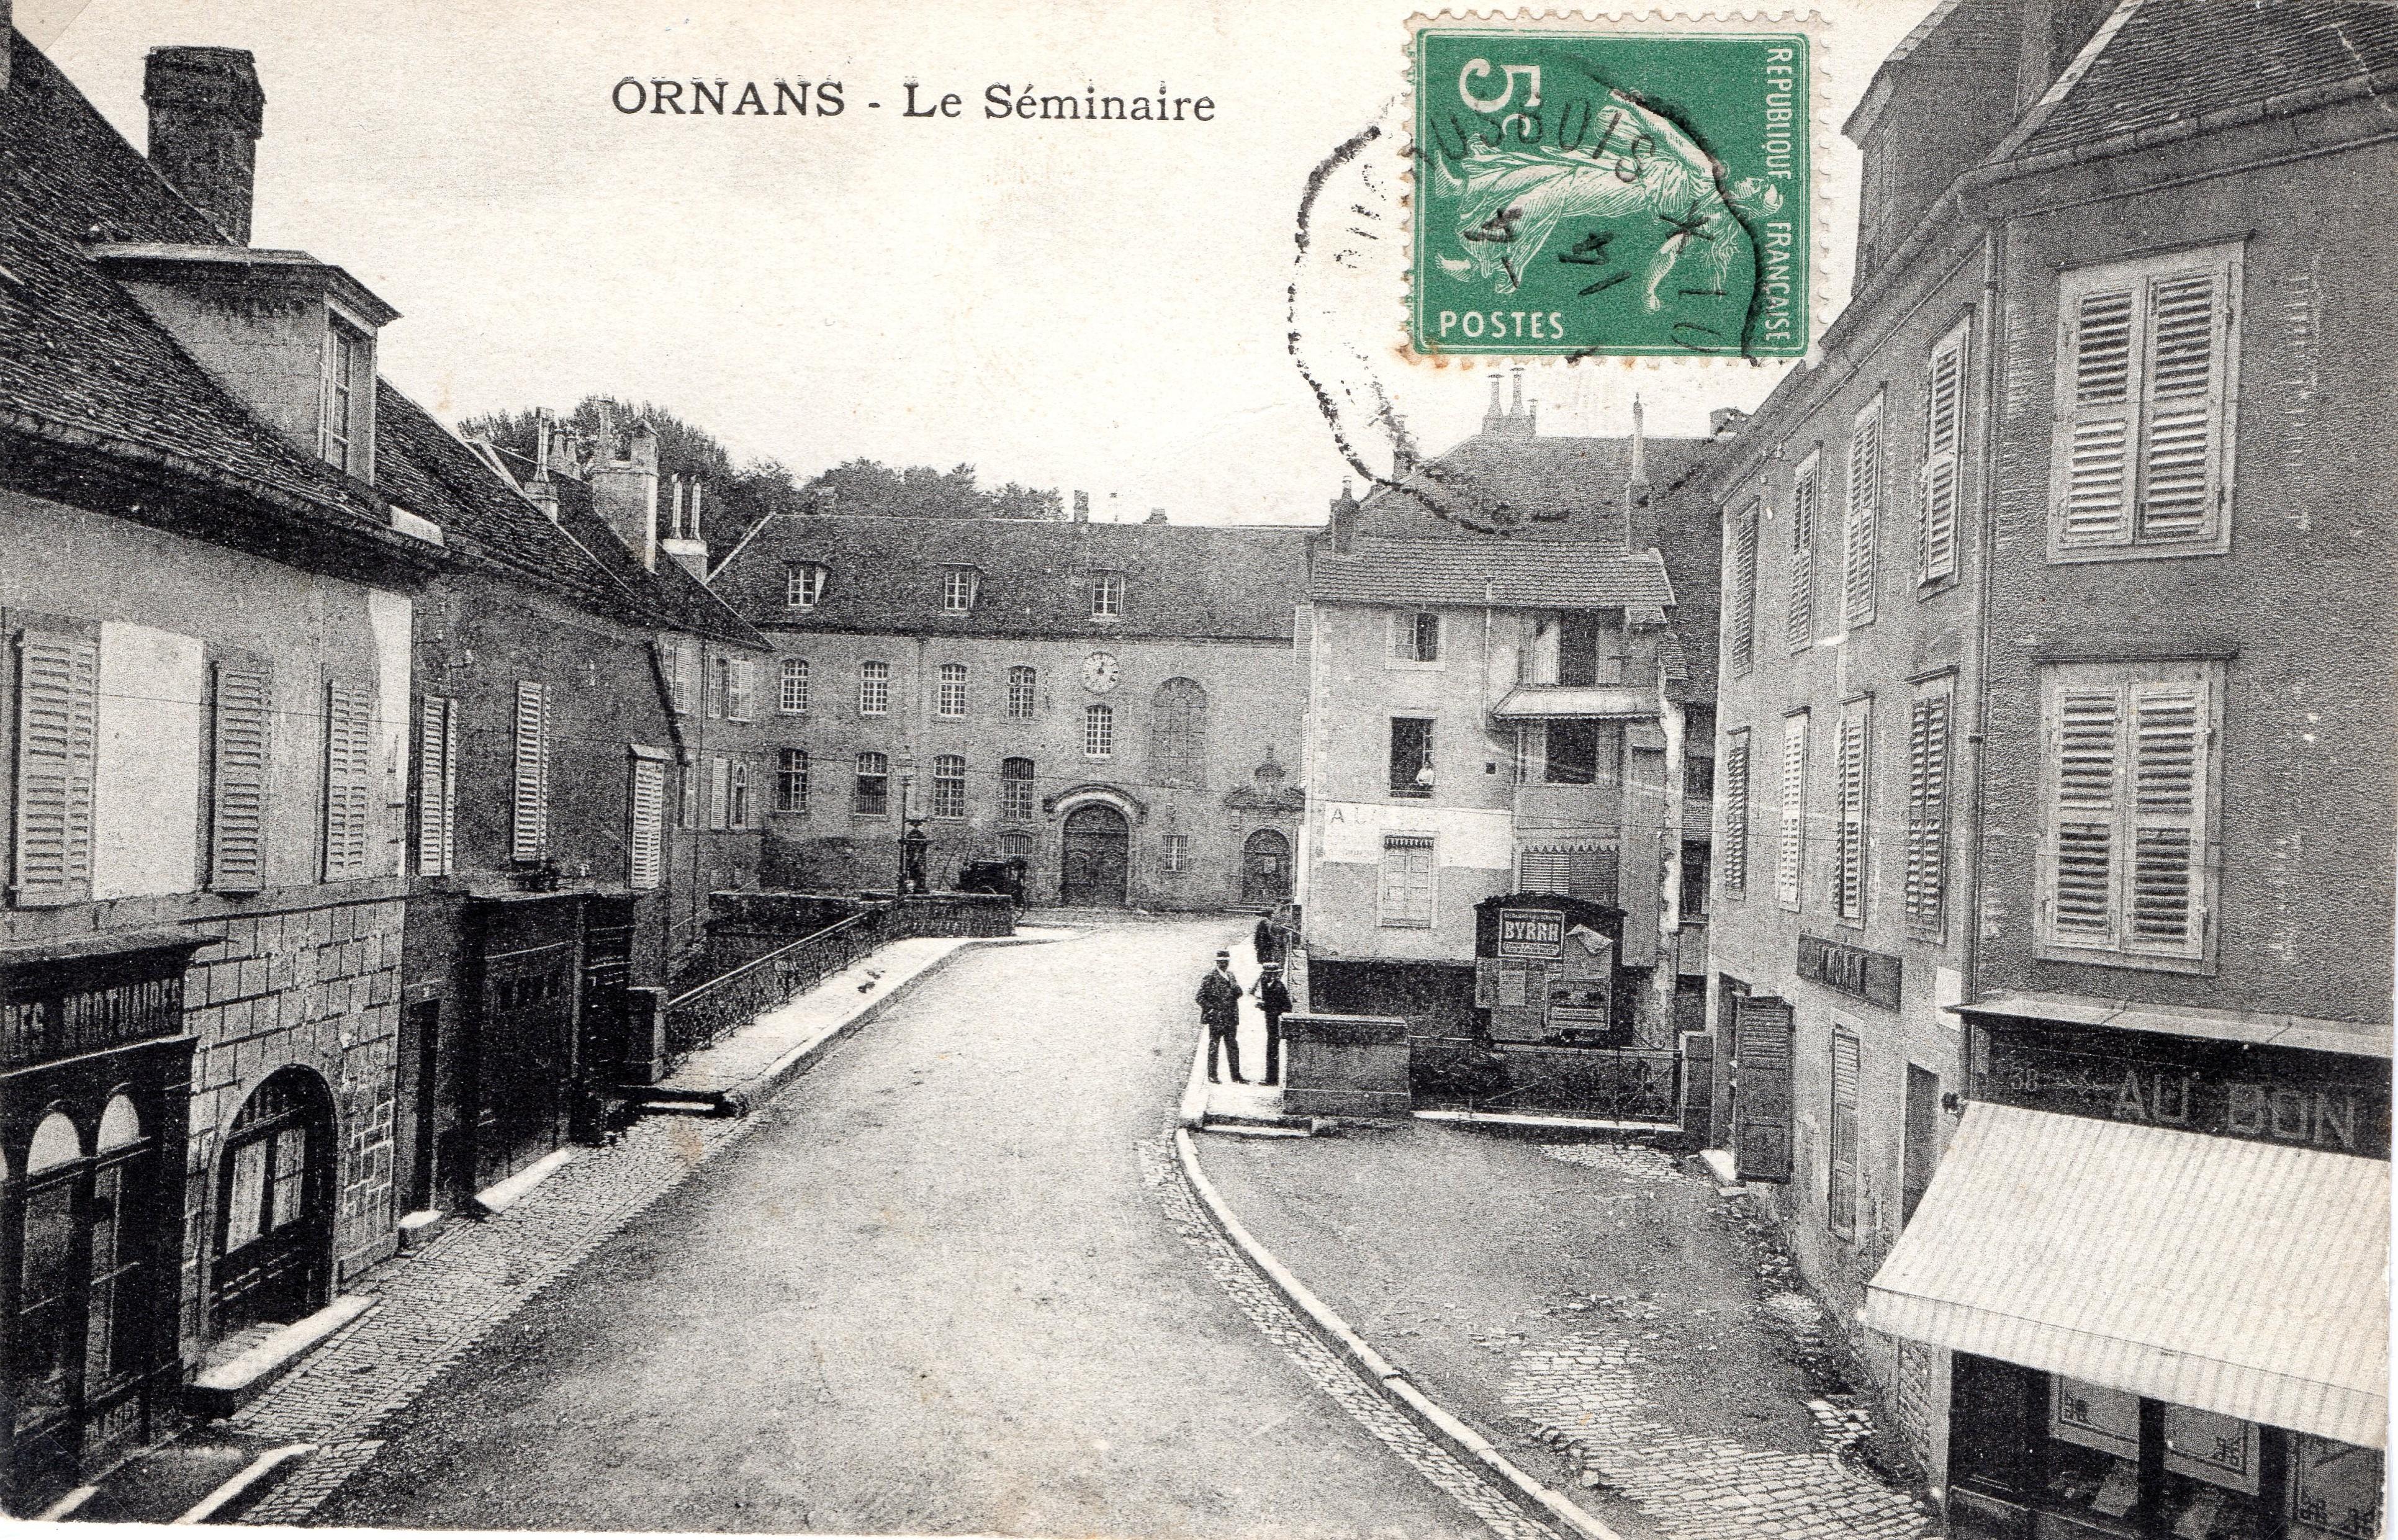 ornans-seminaire461